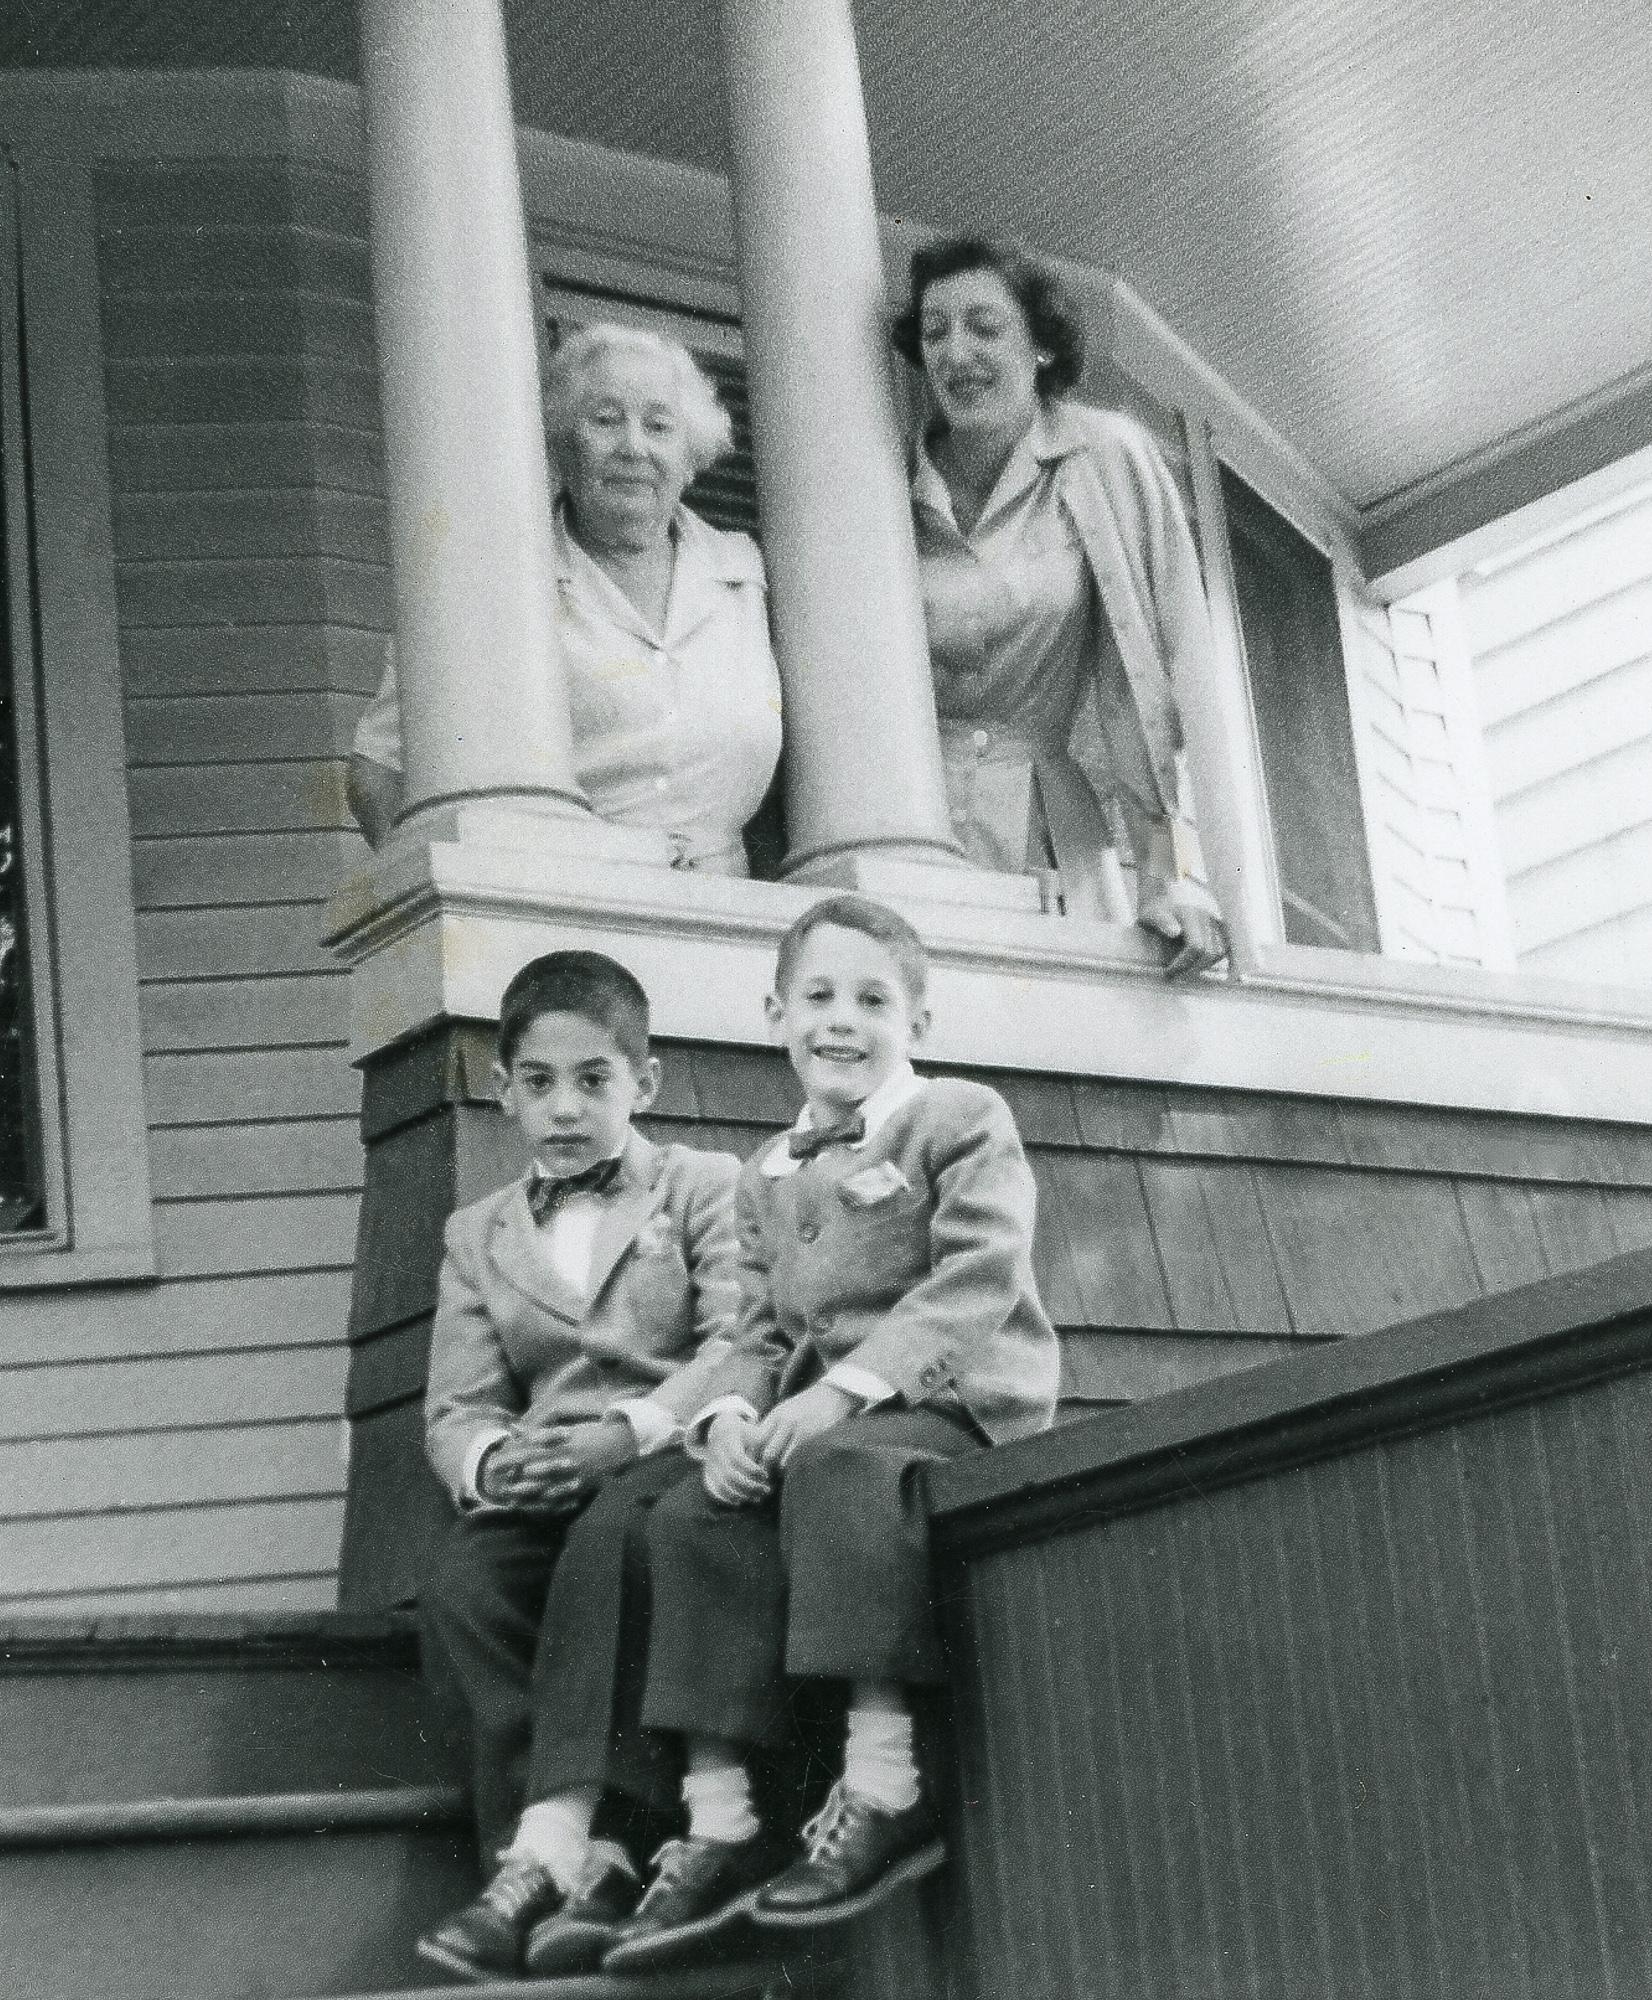 Nana, Mom, Richard and me, Willow Street, New Haven, ca 1955.